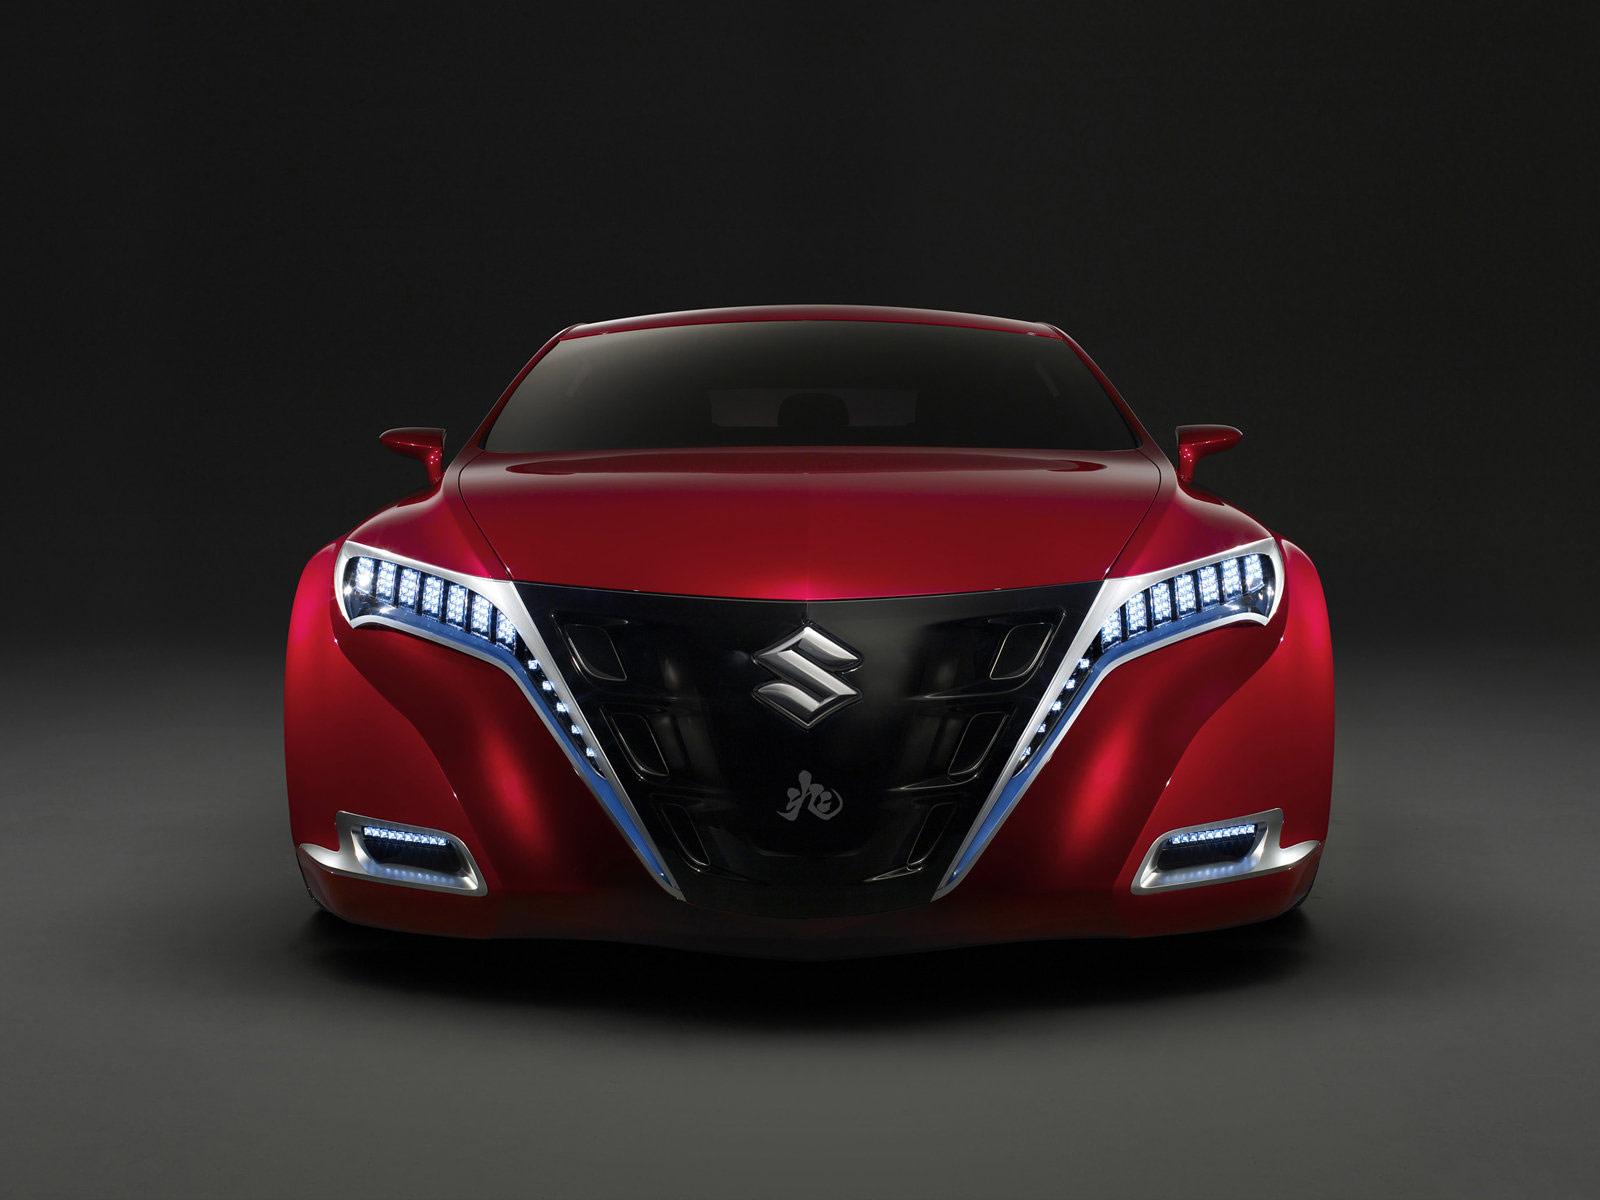 cars tuning suzuki kizashi concept pictures. Black Bedroom Furniture Sets. Home Design Ideas